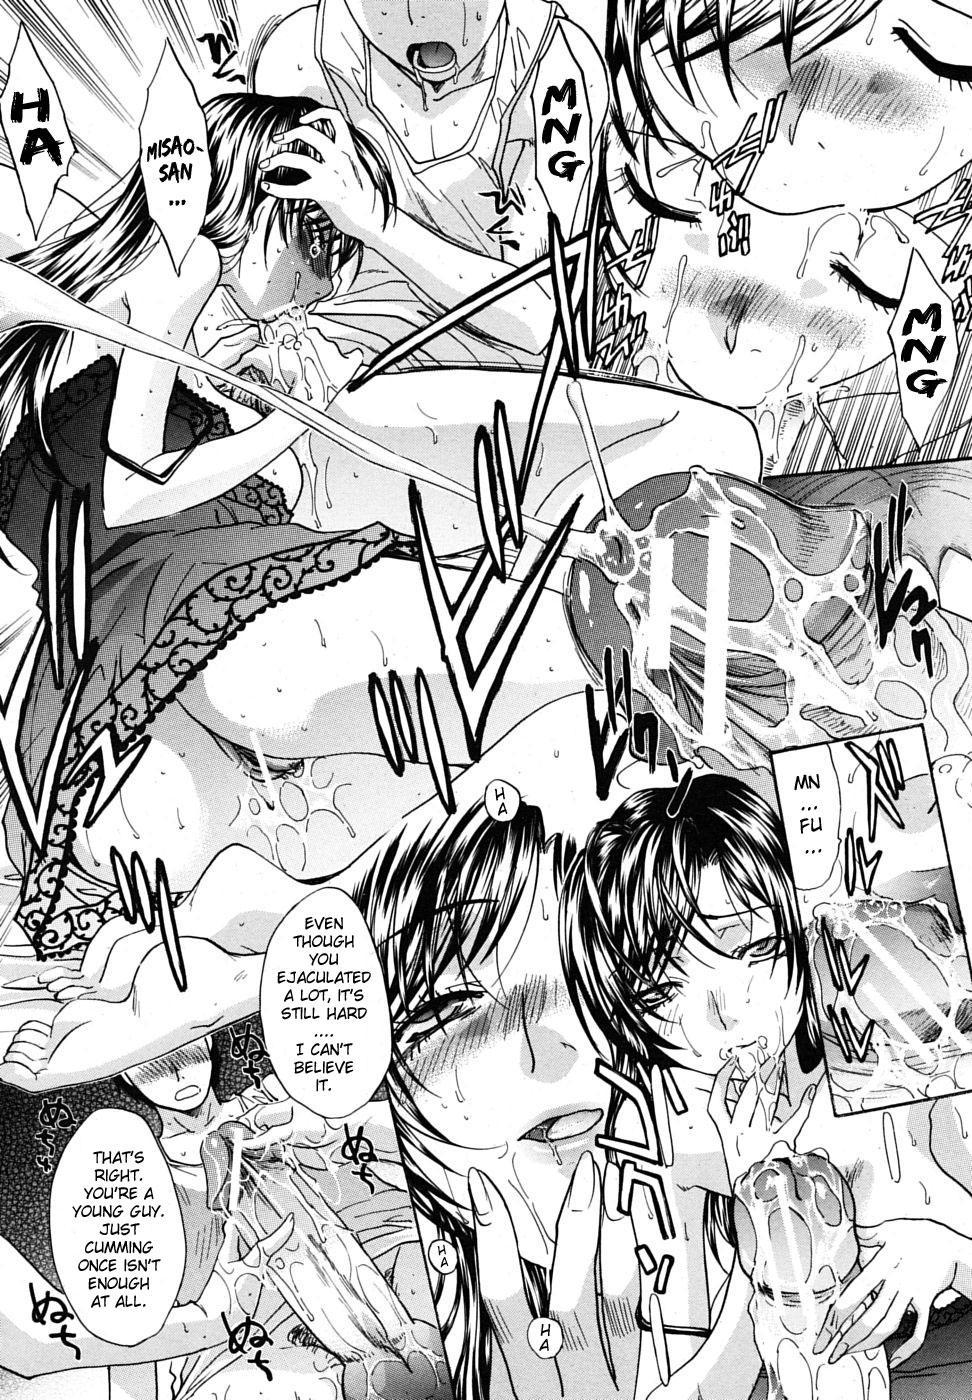 Mesu Oba Misao Arc plus Gaiden 14